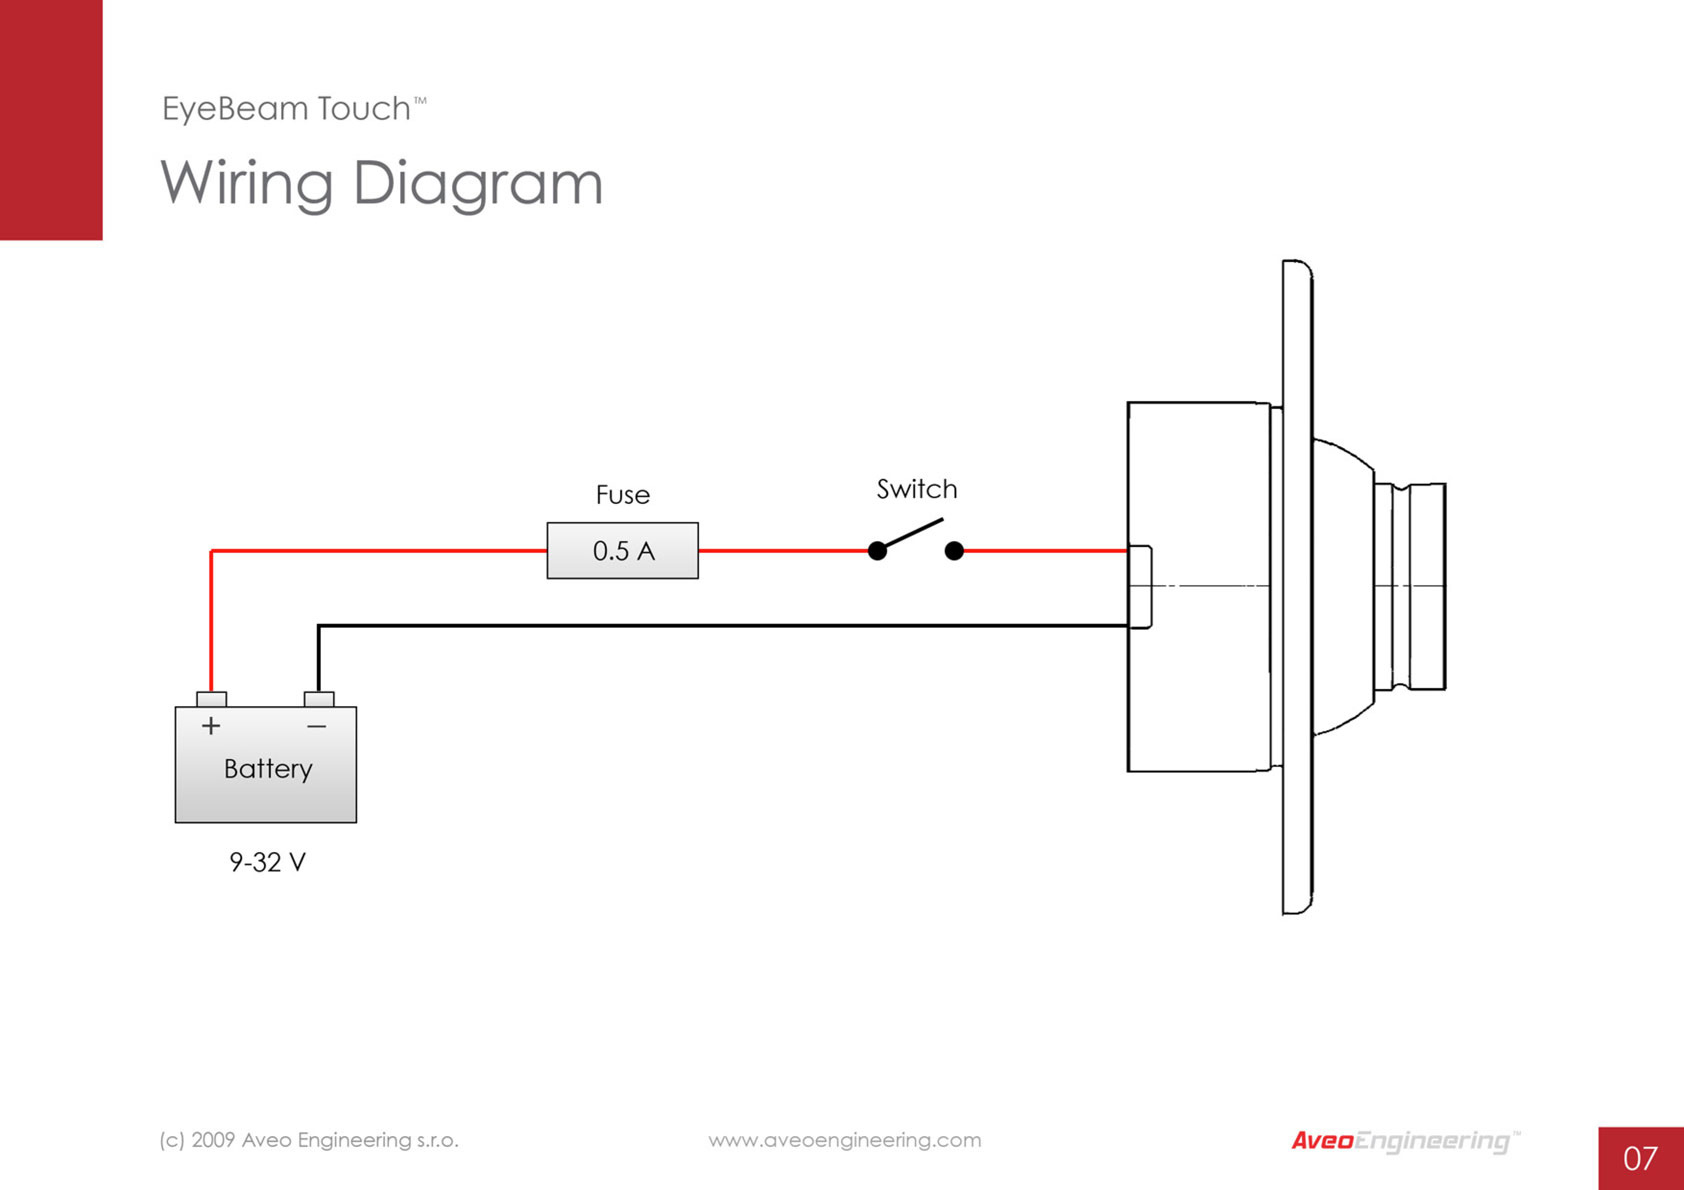 Lightning Headphone Jack Wiring Diagram - Wiring Diagram Explained - Headphone Jack Wiring Diagram